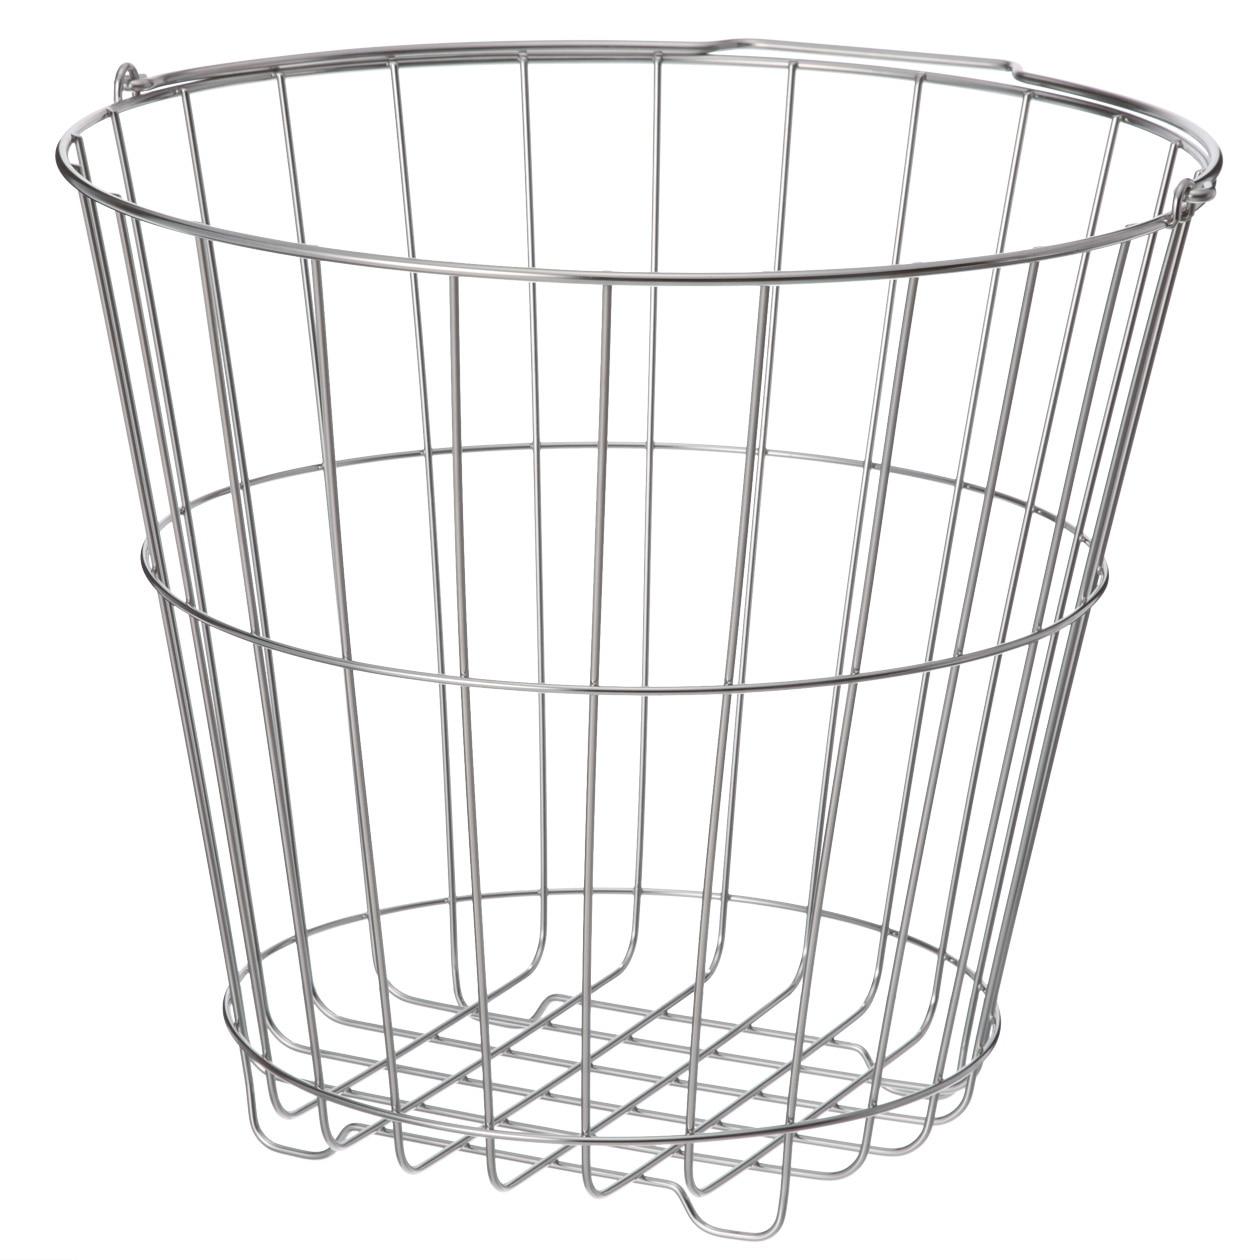 RoomClip商品情報 - ステンレスランドリーバスケット・大